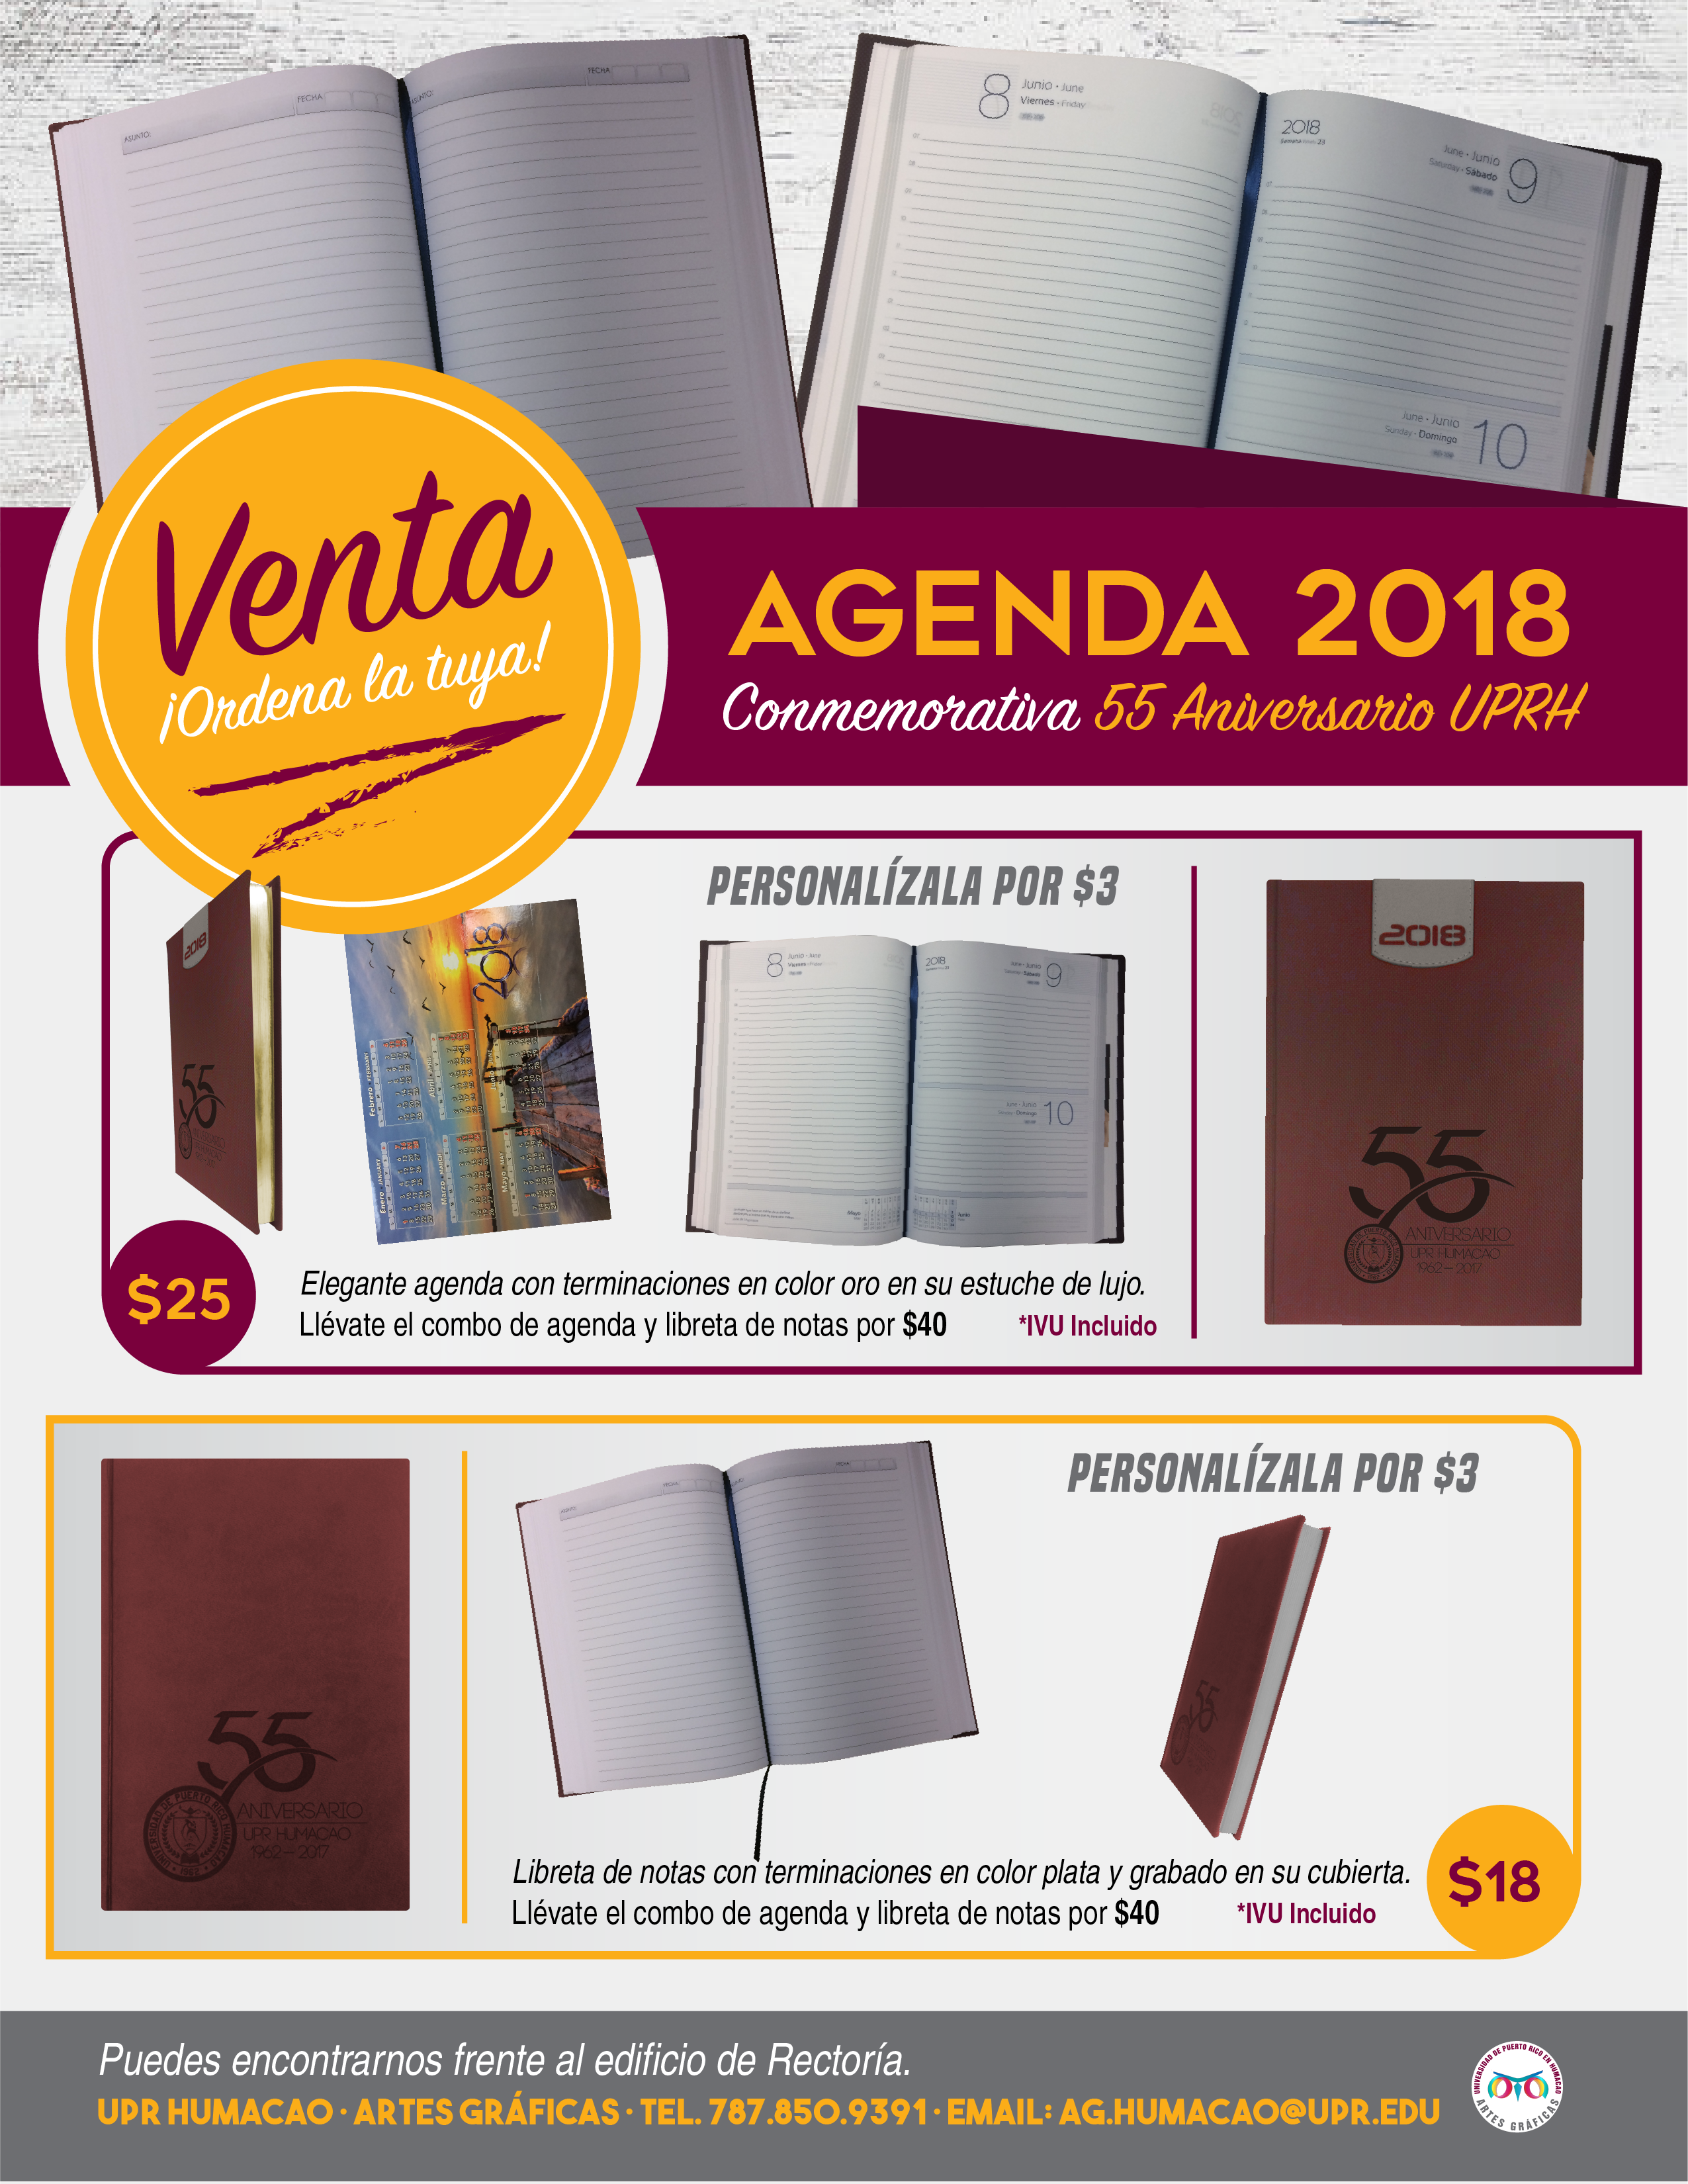 Promo para Agenda 2018